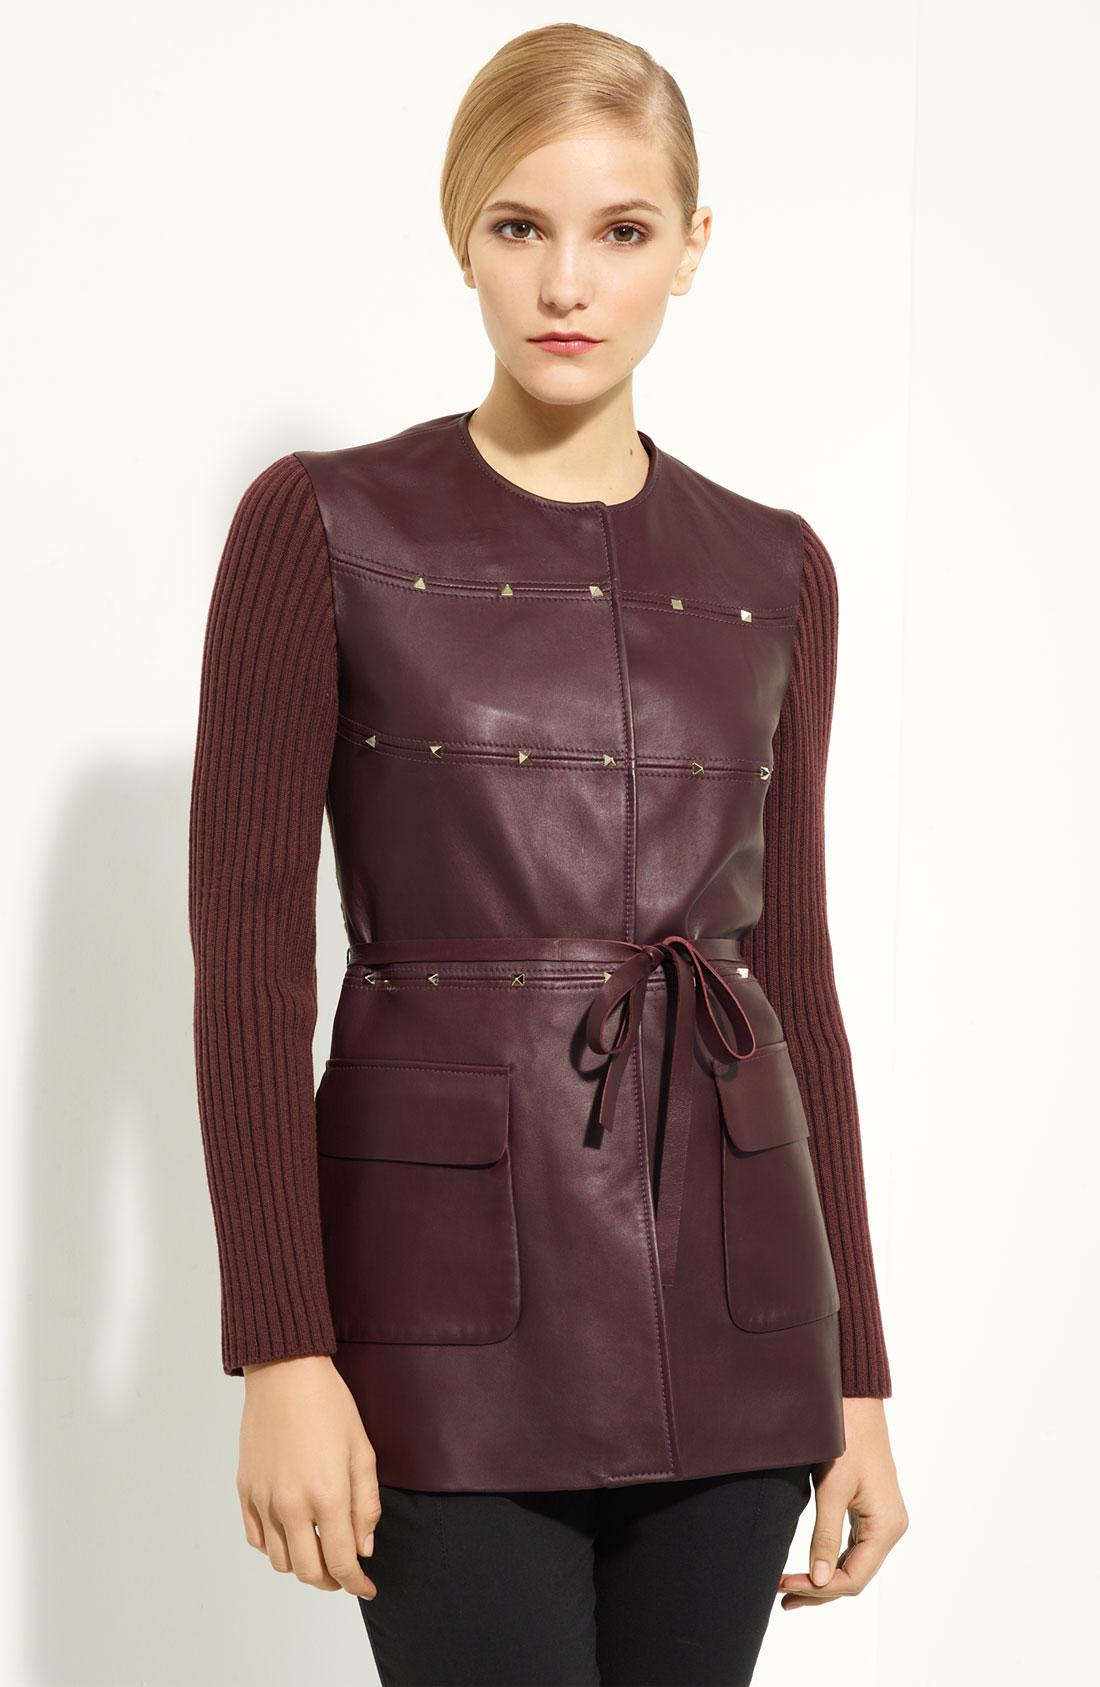 Knit leather jacket